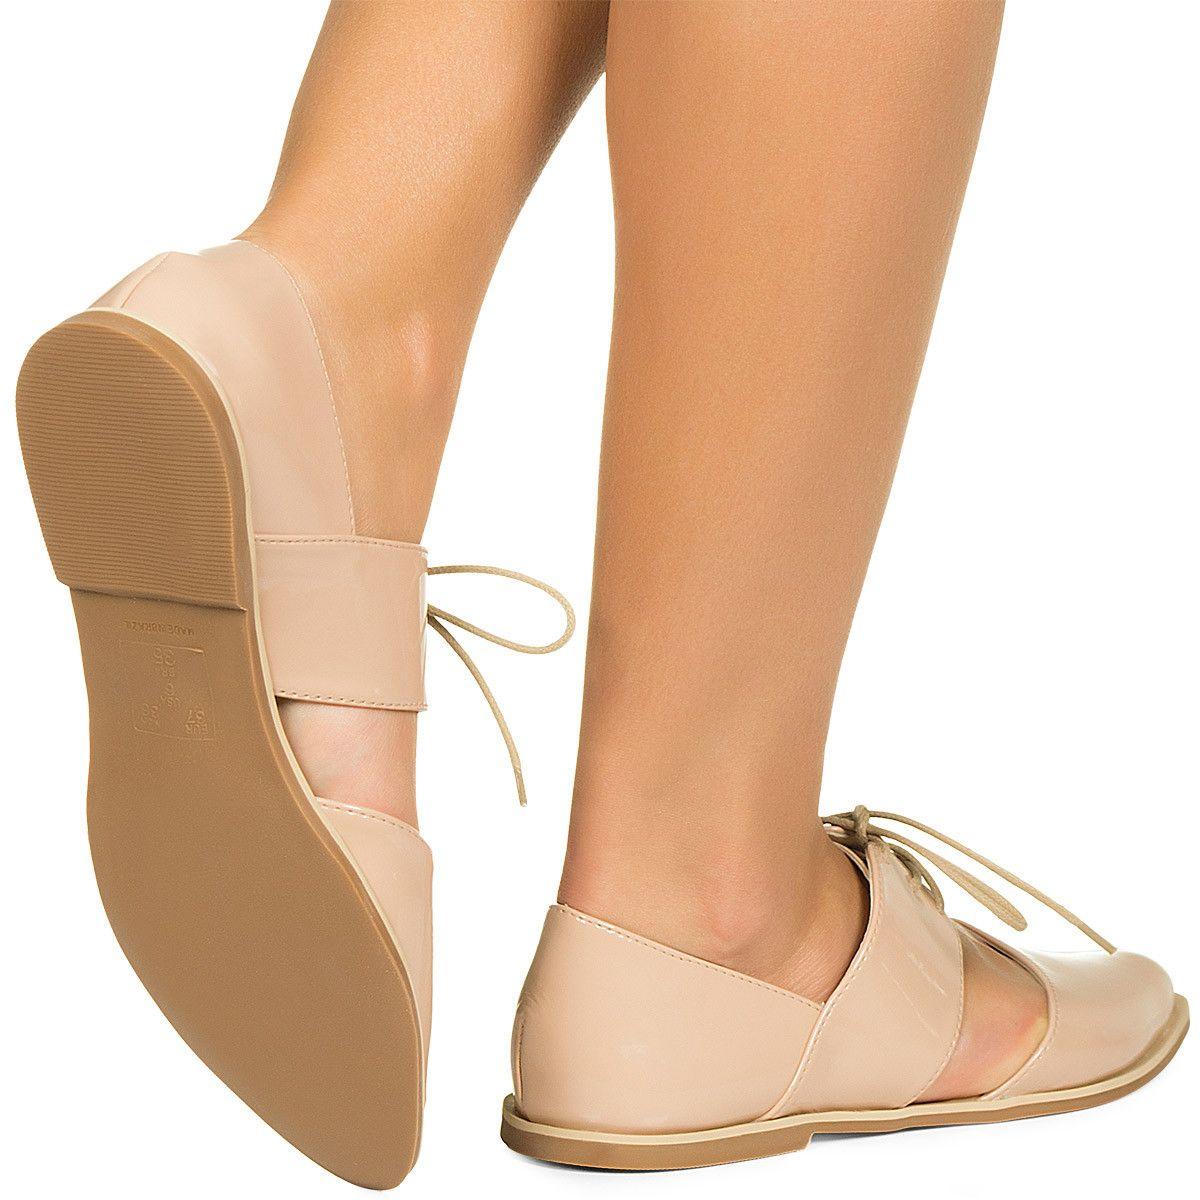 f274871c11 Sapato Oxford Aberto Nude Verniz Taquilla - Taquilla - Loja online de sapatos  femininos